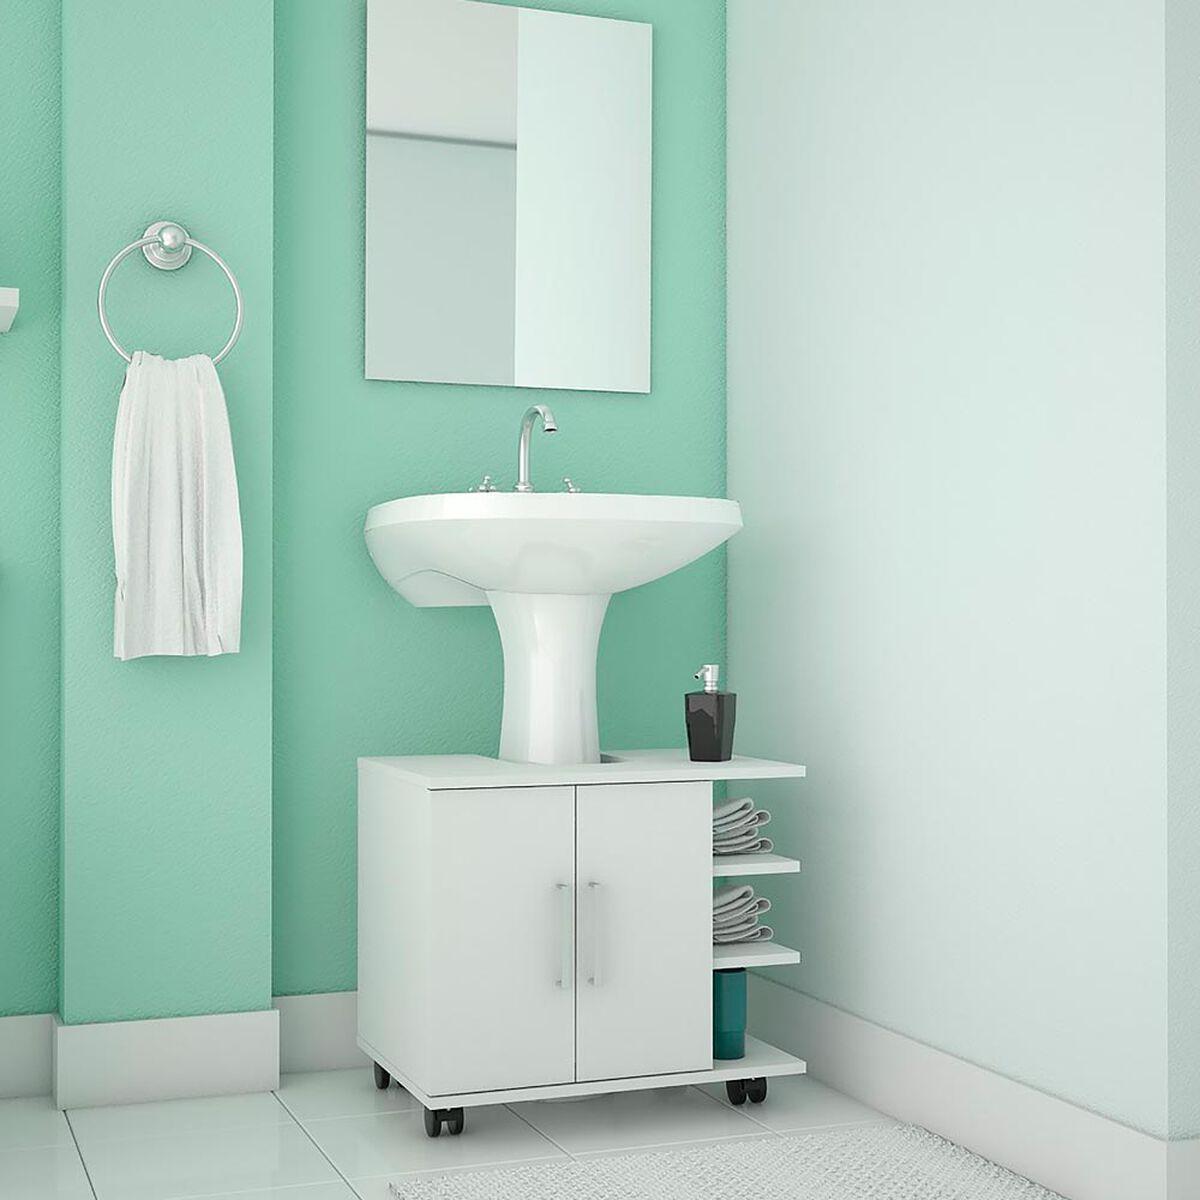 Mueble para Lavamanos TuHome Bath-55